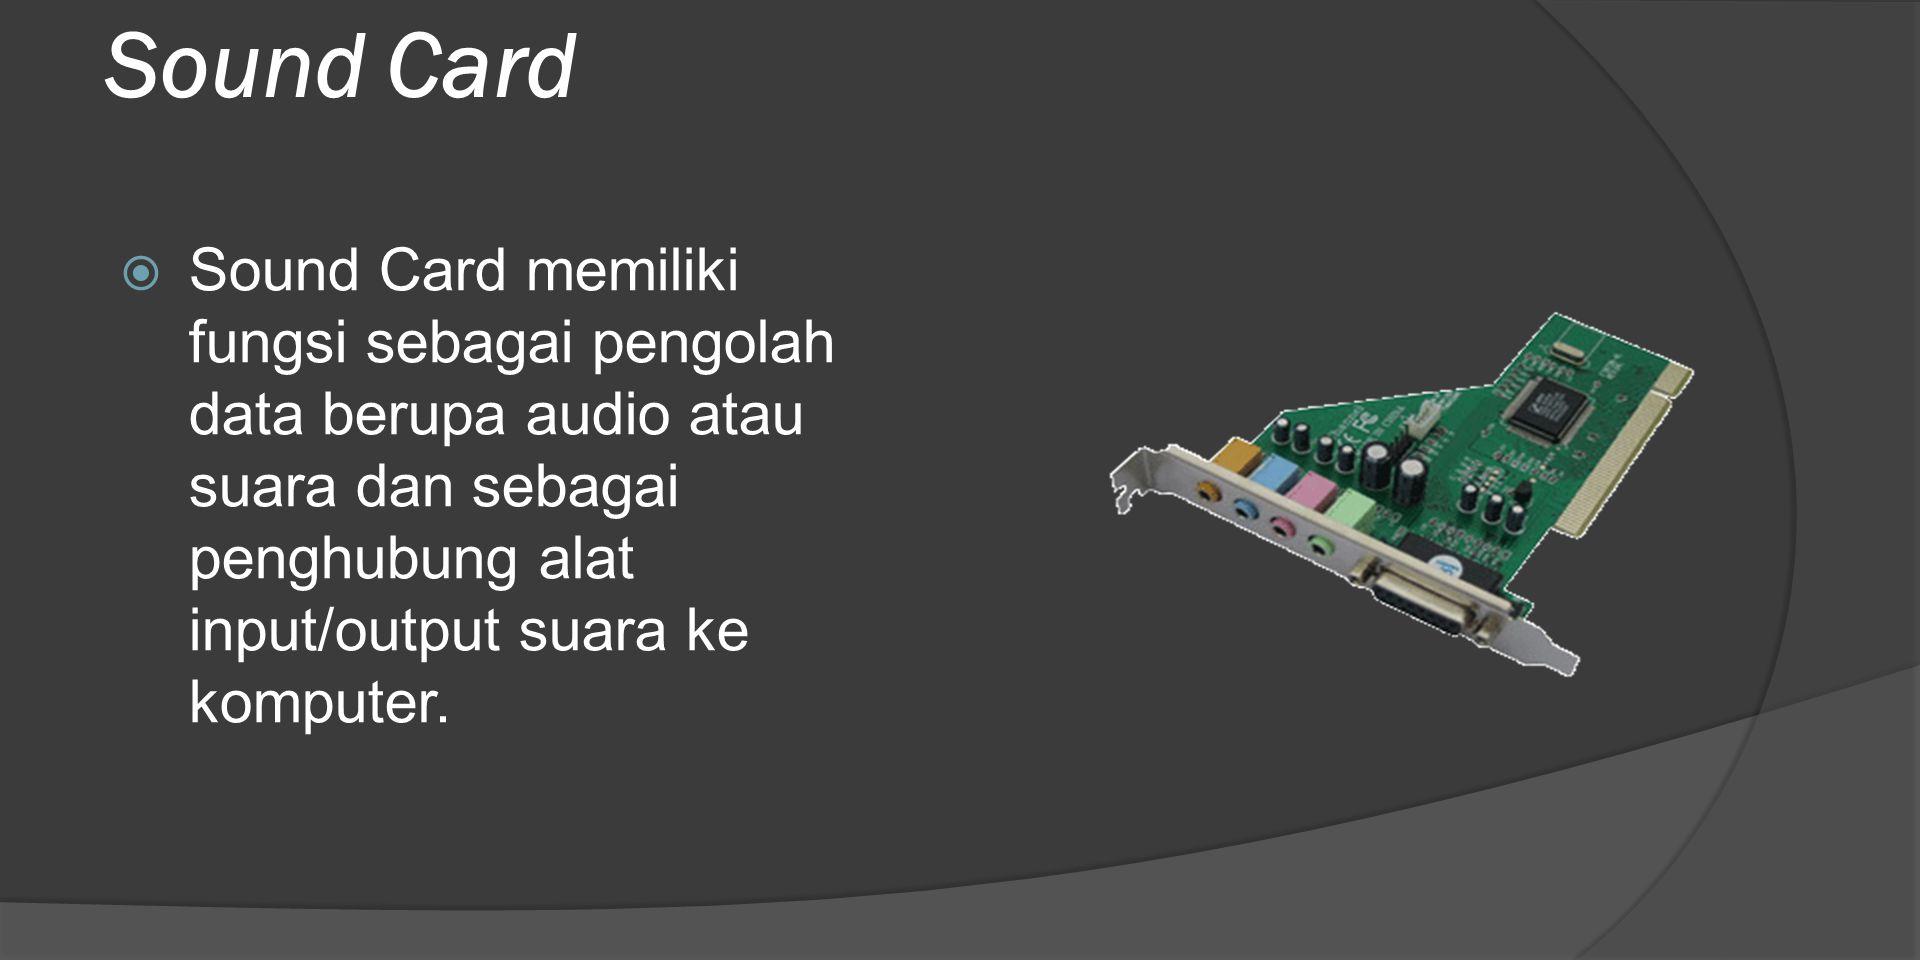 Sound Card  Sound Card memiliki fungsi sebagai pengolah data berupa audio atau suara dan sebagai penghubung alat input/output suara ke komputer.